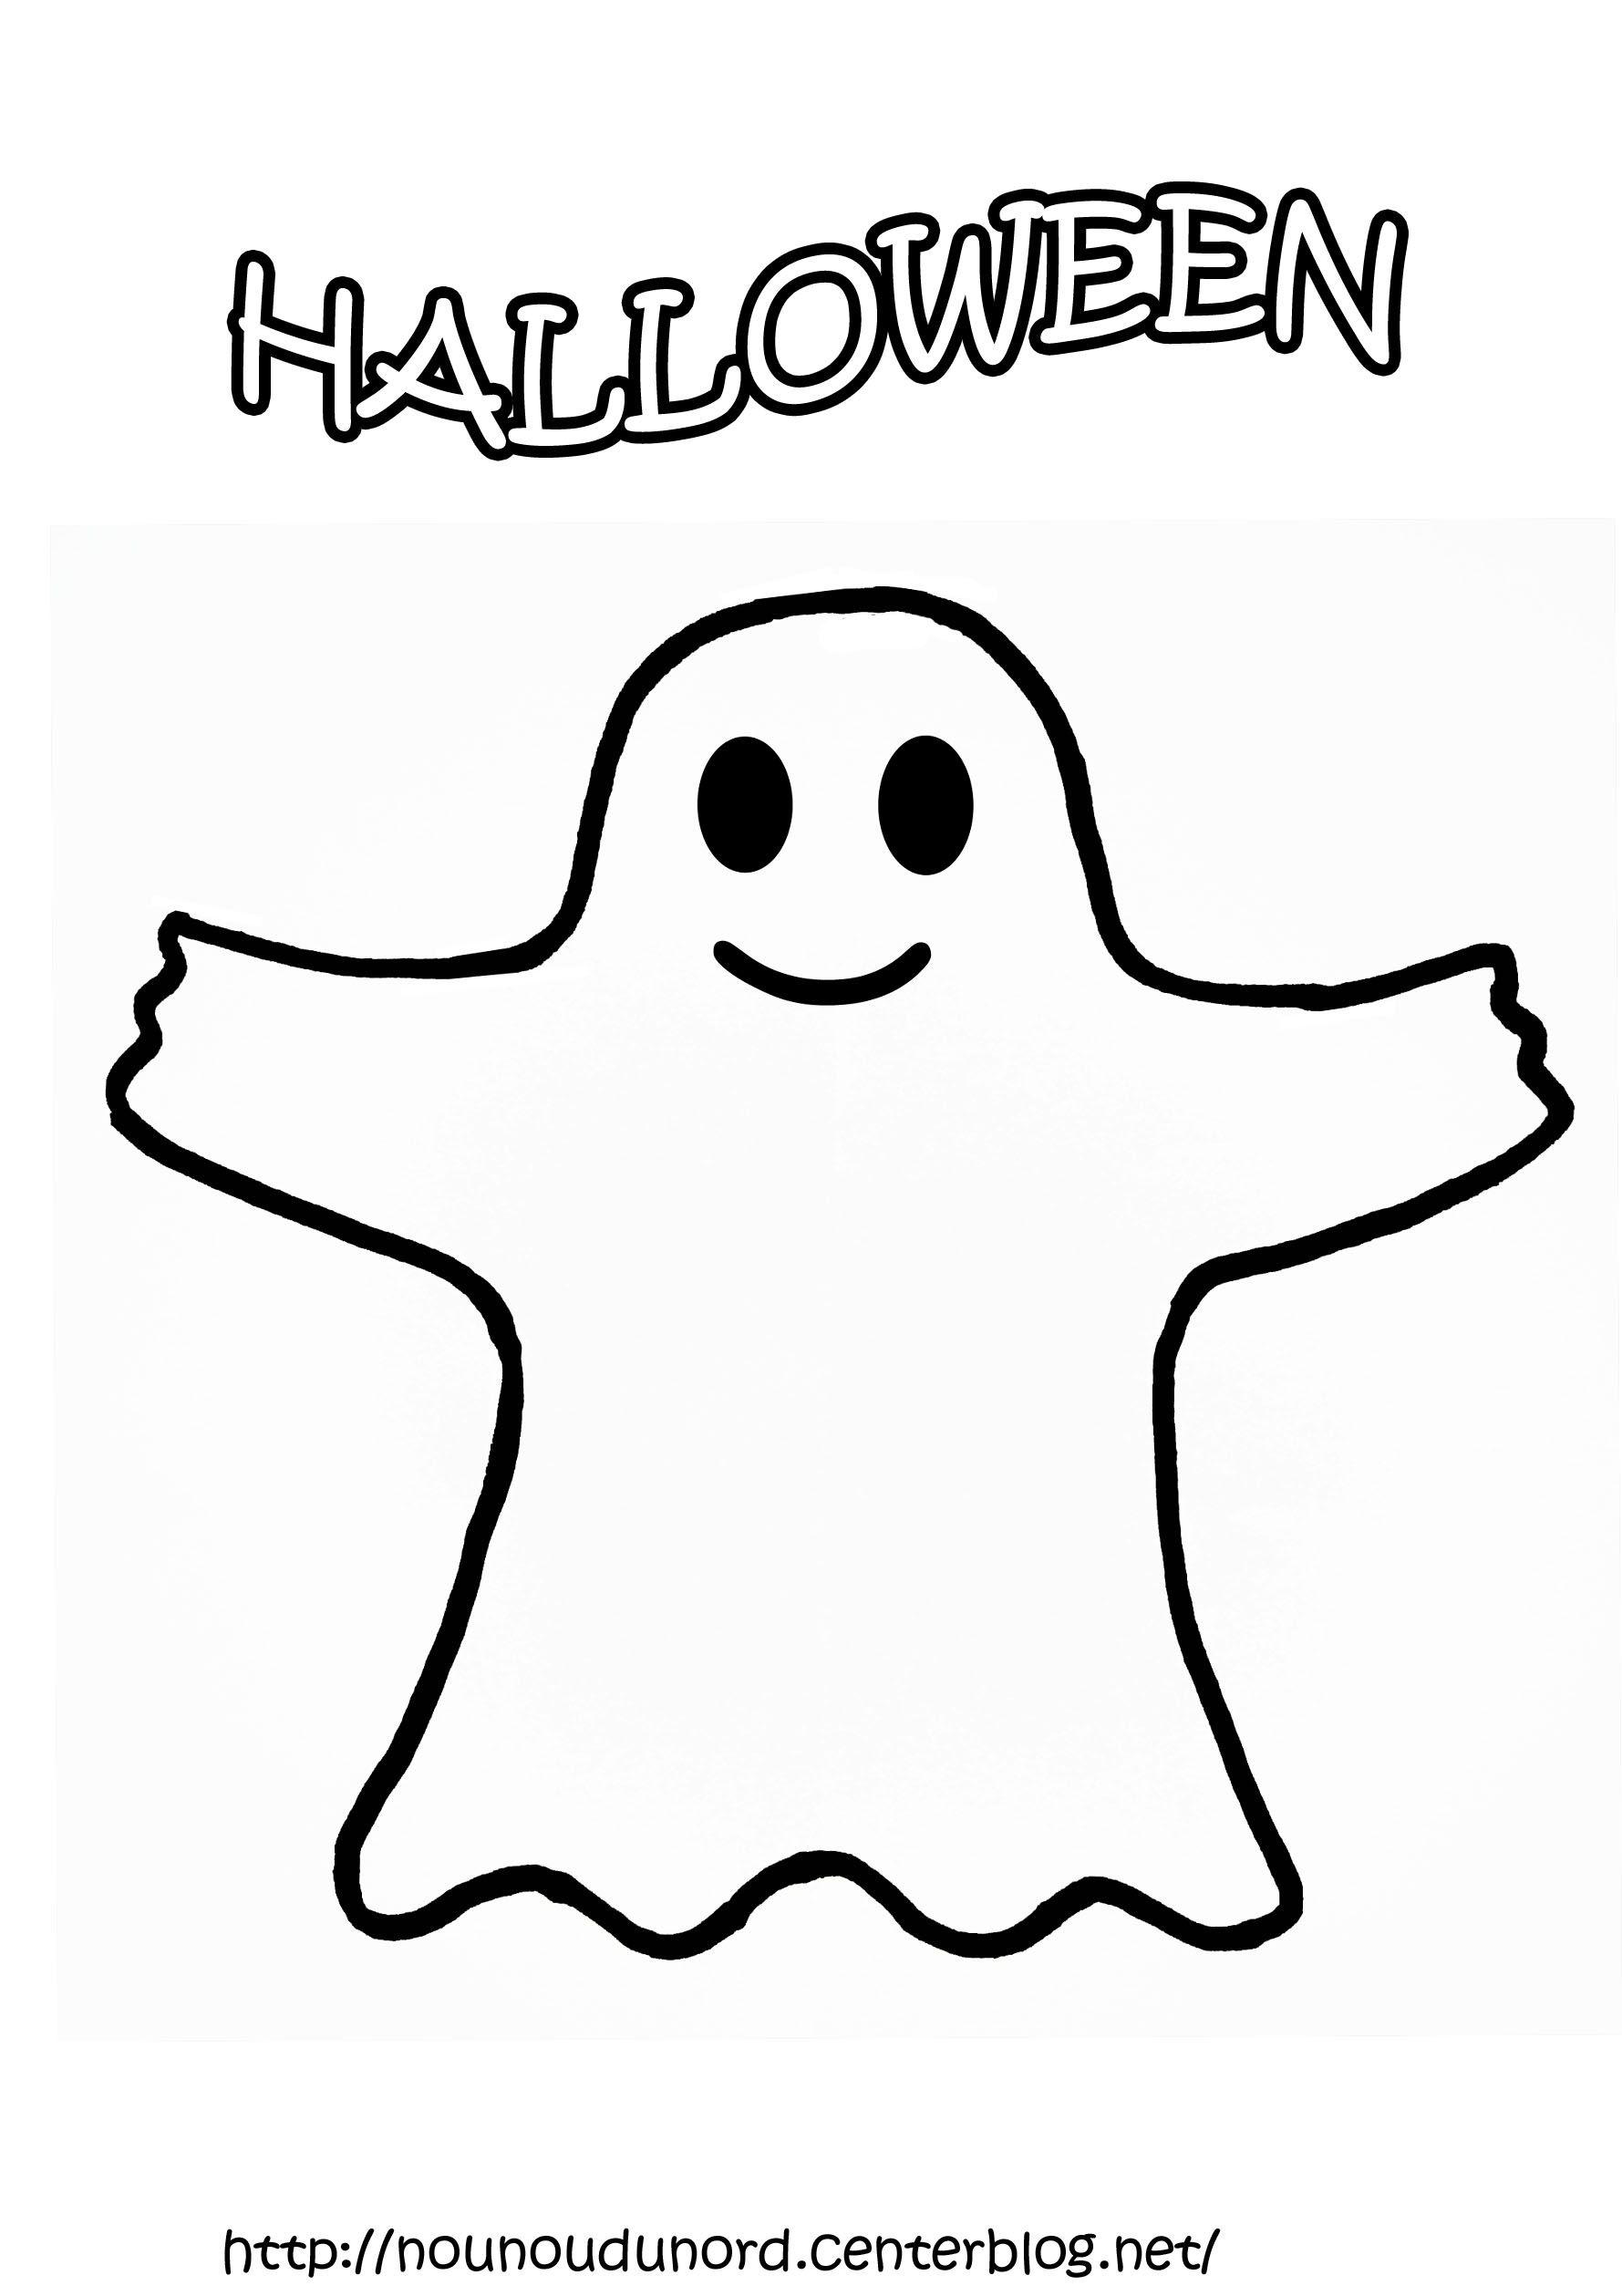 Dessin fantôme 14943 Coloriage halloween a imprimer